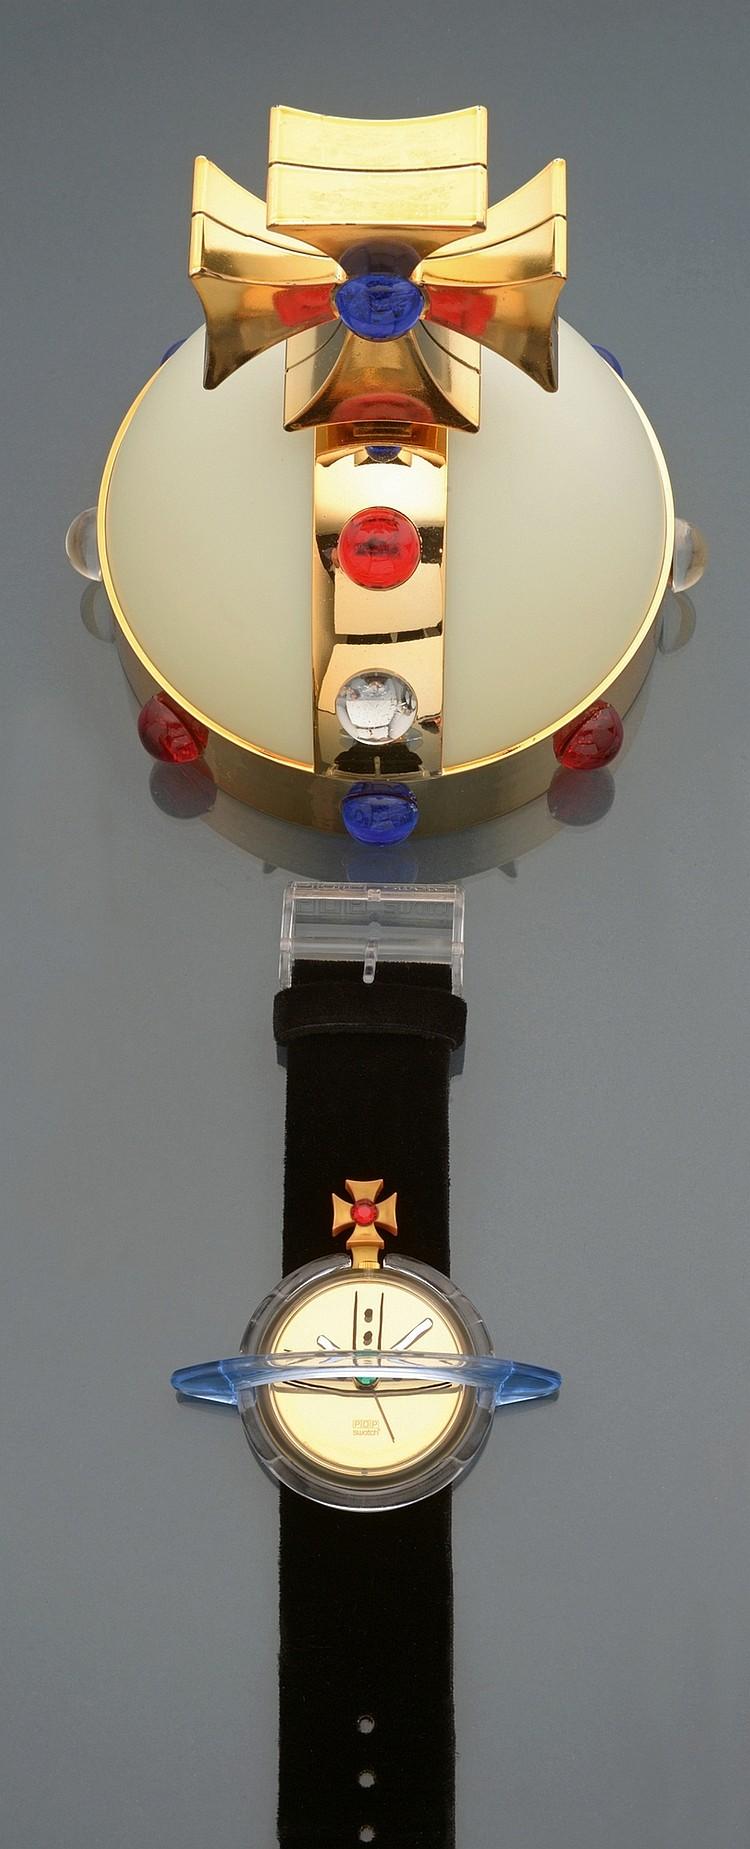 Swatch Modèle Asetra L